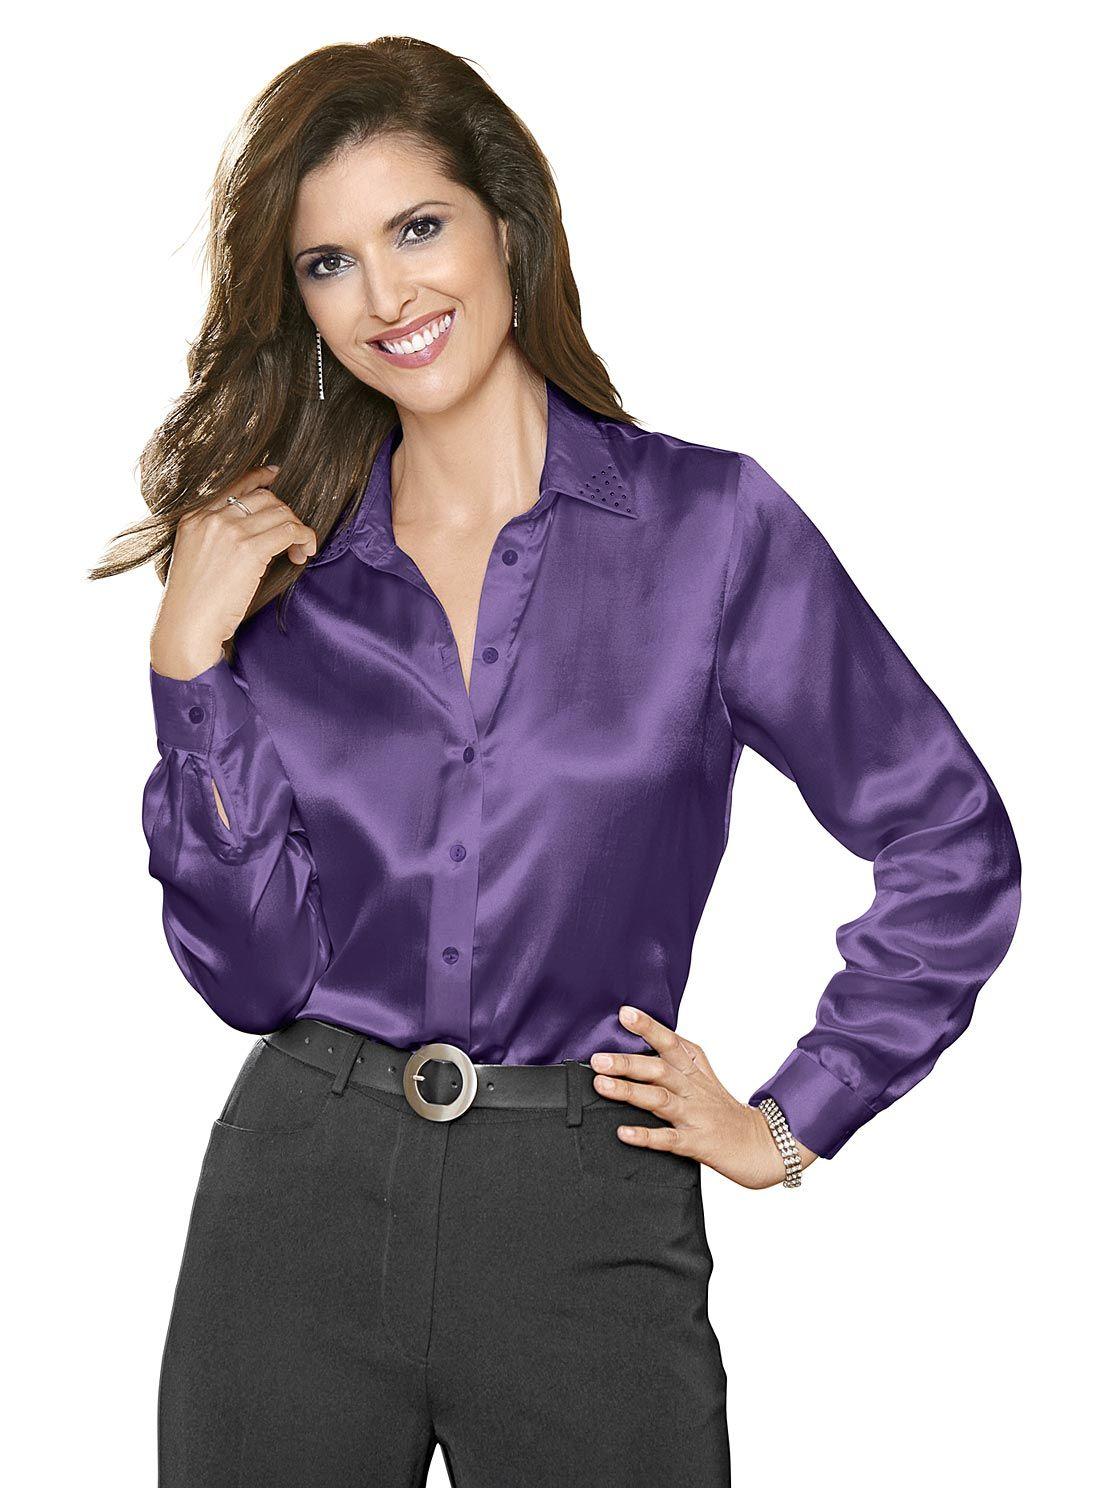 45fe16f9a33d90 Satin-Bluse in lila 29,99 € kaufen bei WITT Weiden – 451.284.010 ...